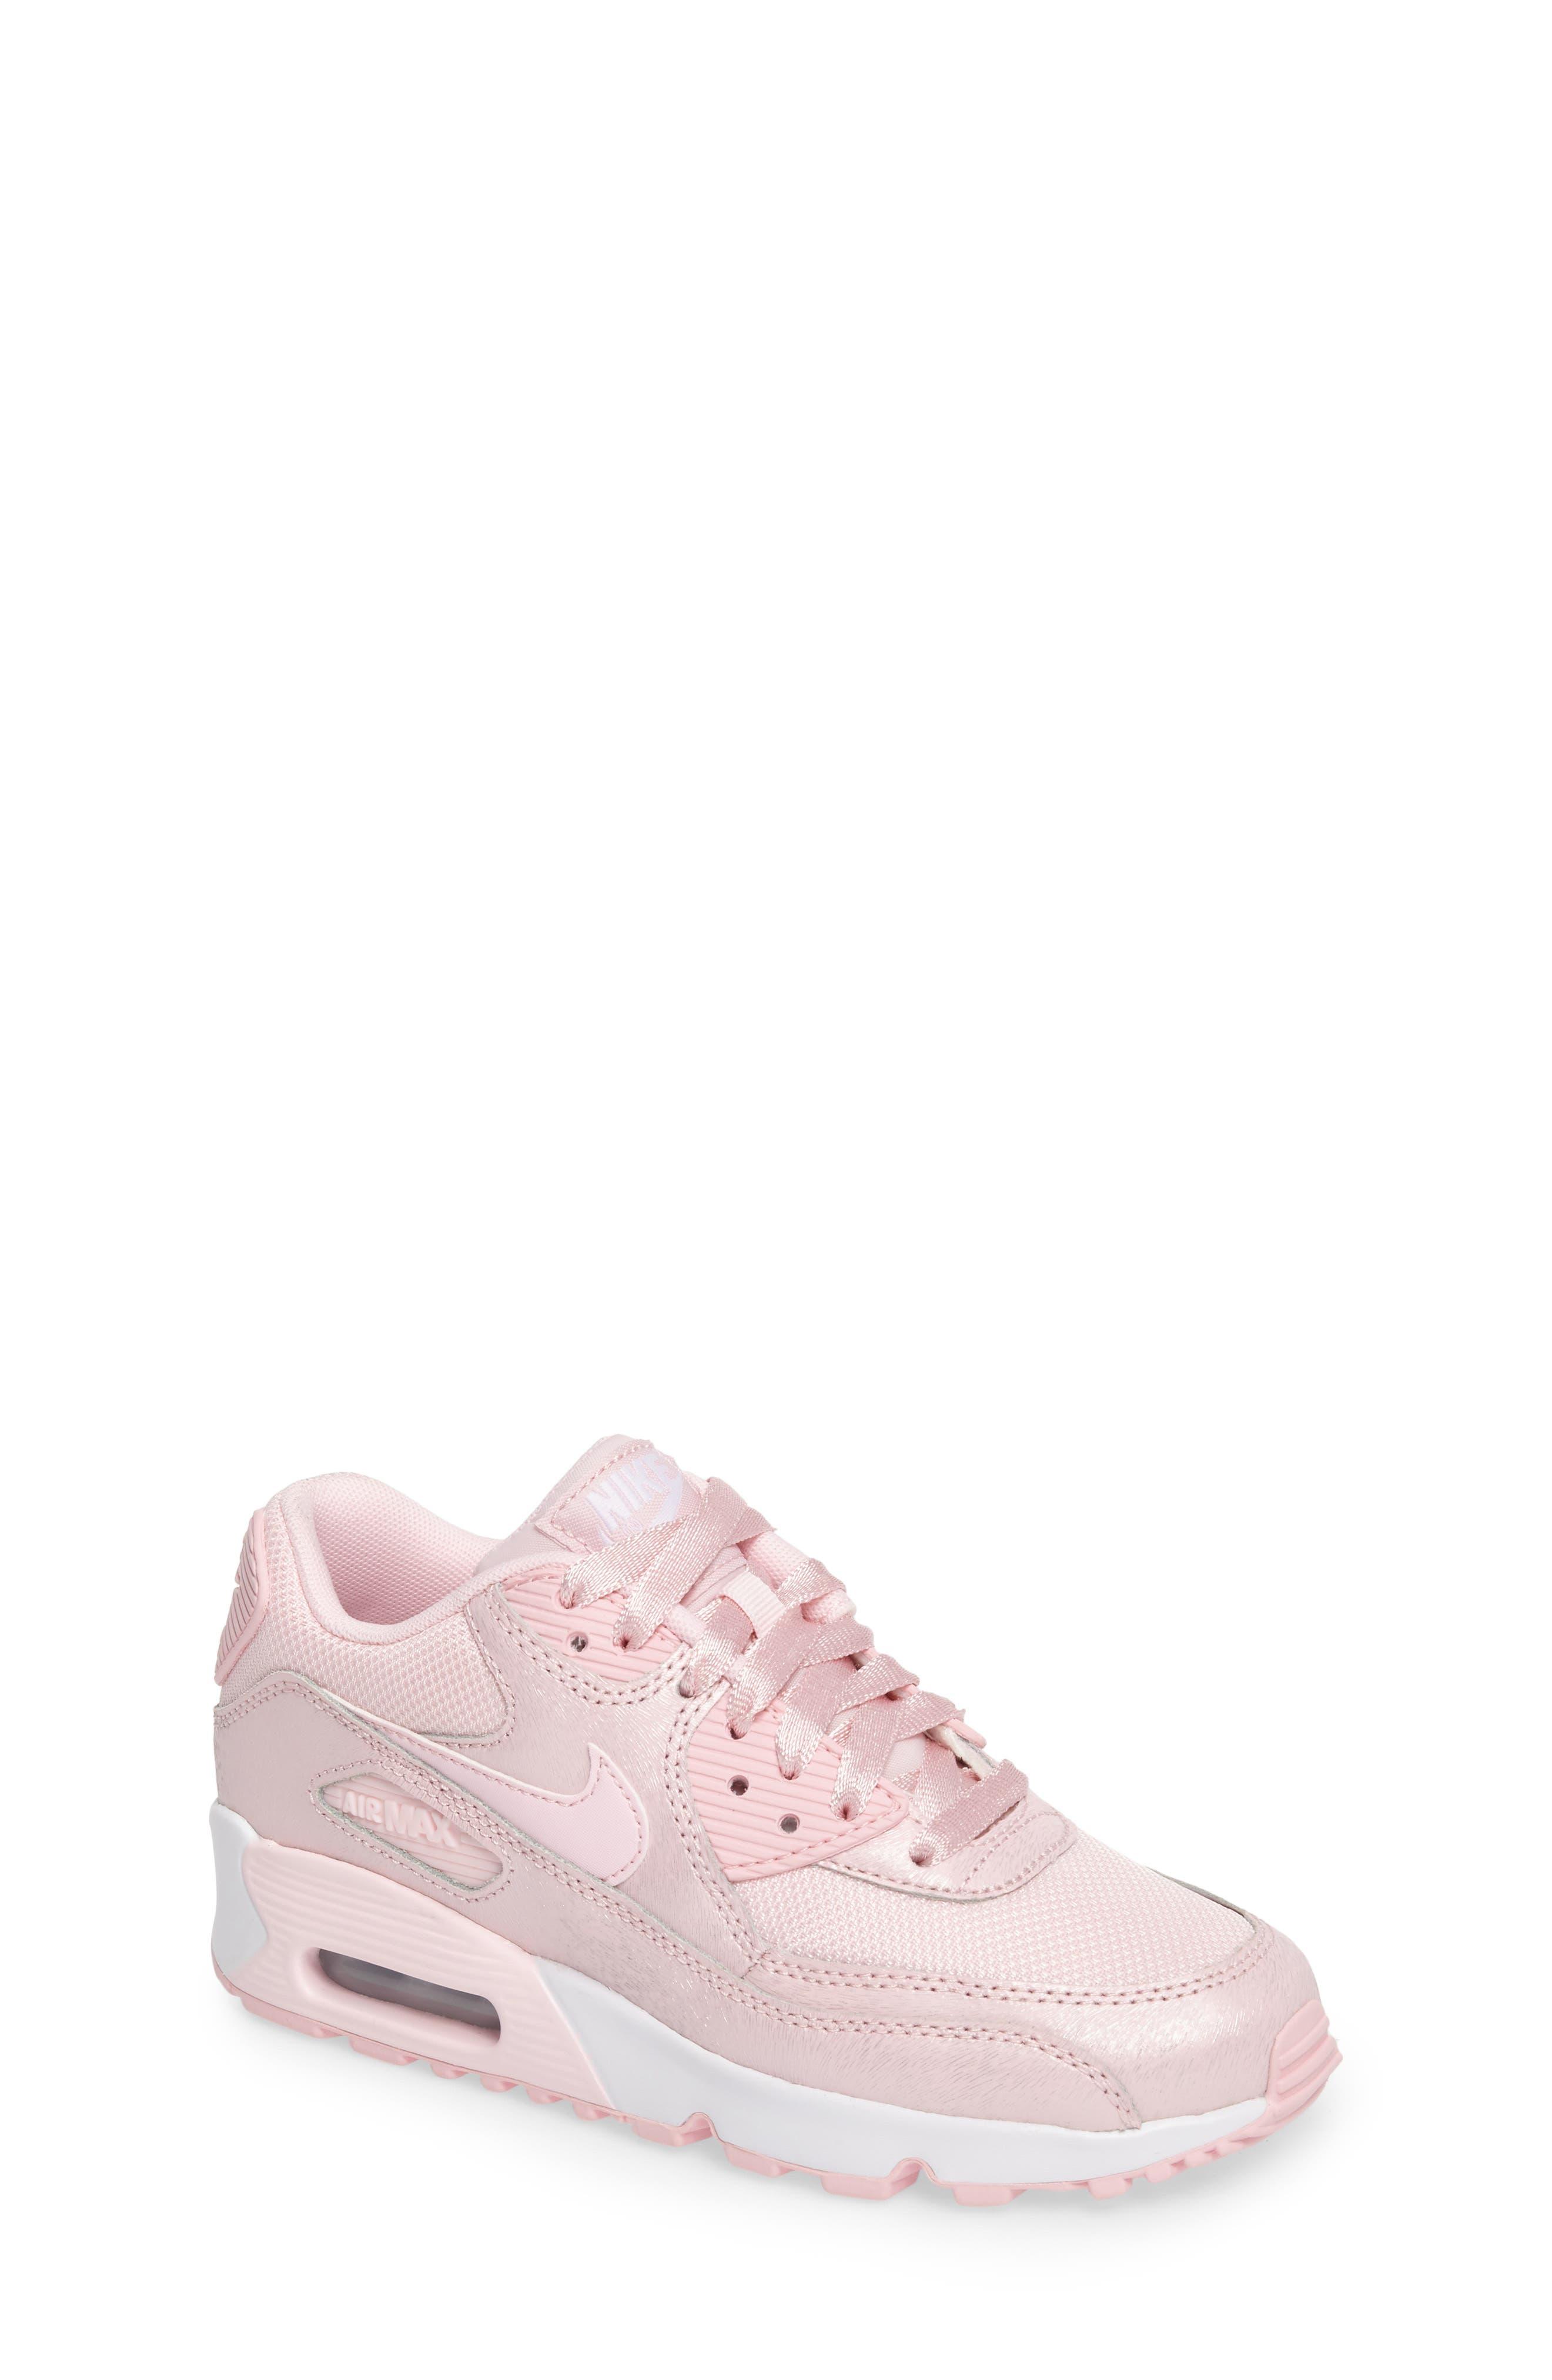 Air Max 90 Mesh Sneaker,                             Main thumbnail 1, color,                             650